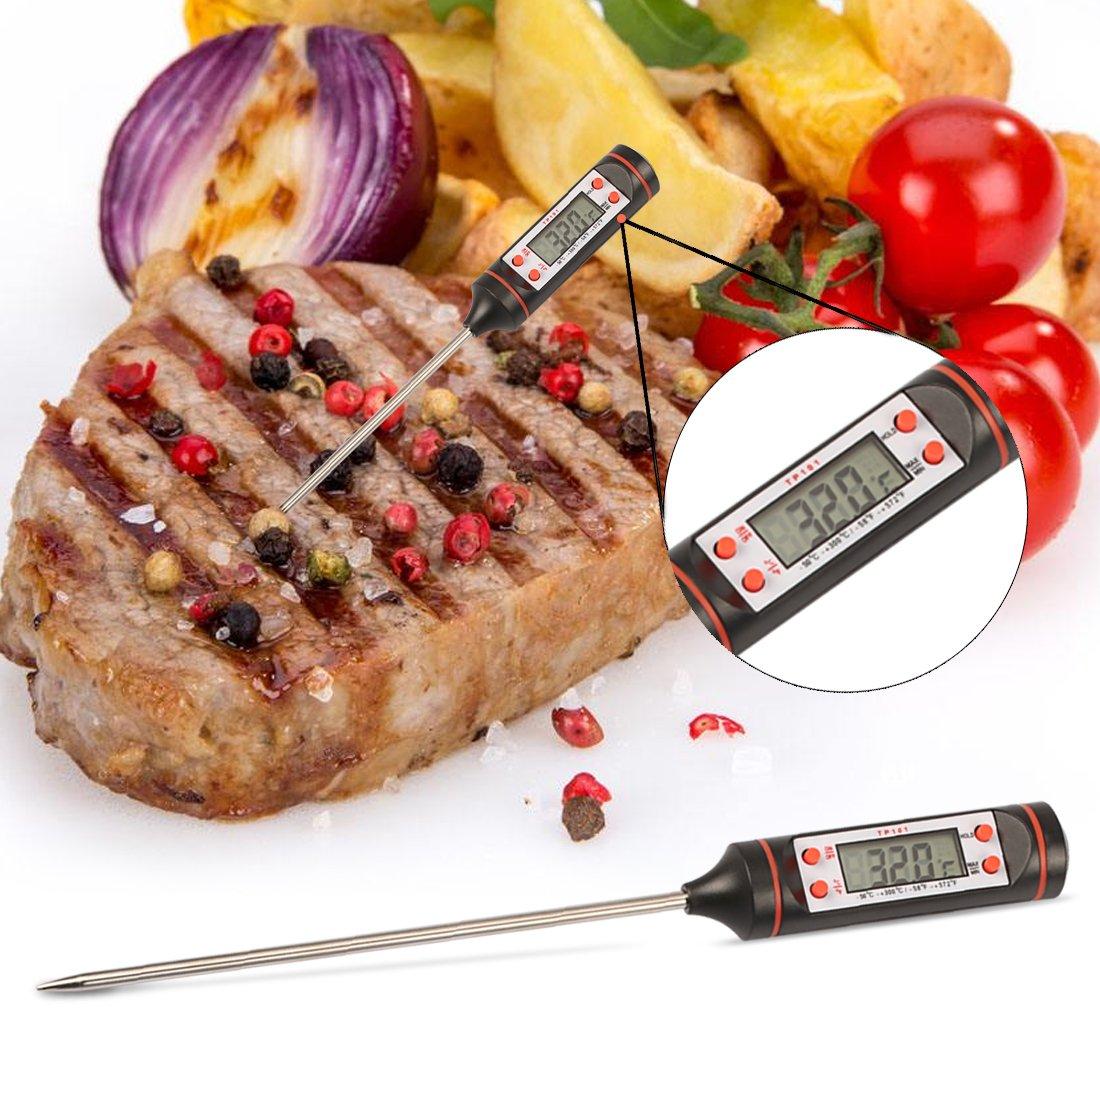 Termómetro Digital de Cocina, Termómetro de Comida Reacción Rápida con Pantalla LCD Sonda Larga Apagado Automático para Alimentación, Carne, BBQ, Horno, Líquido, Comida Bebé, Bebida, etc